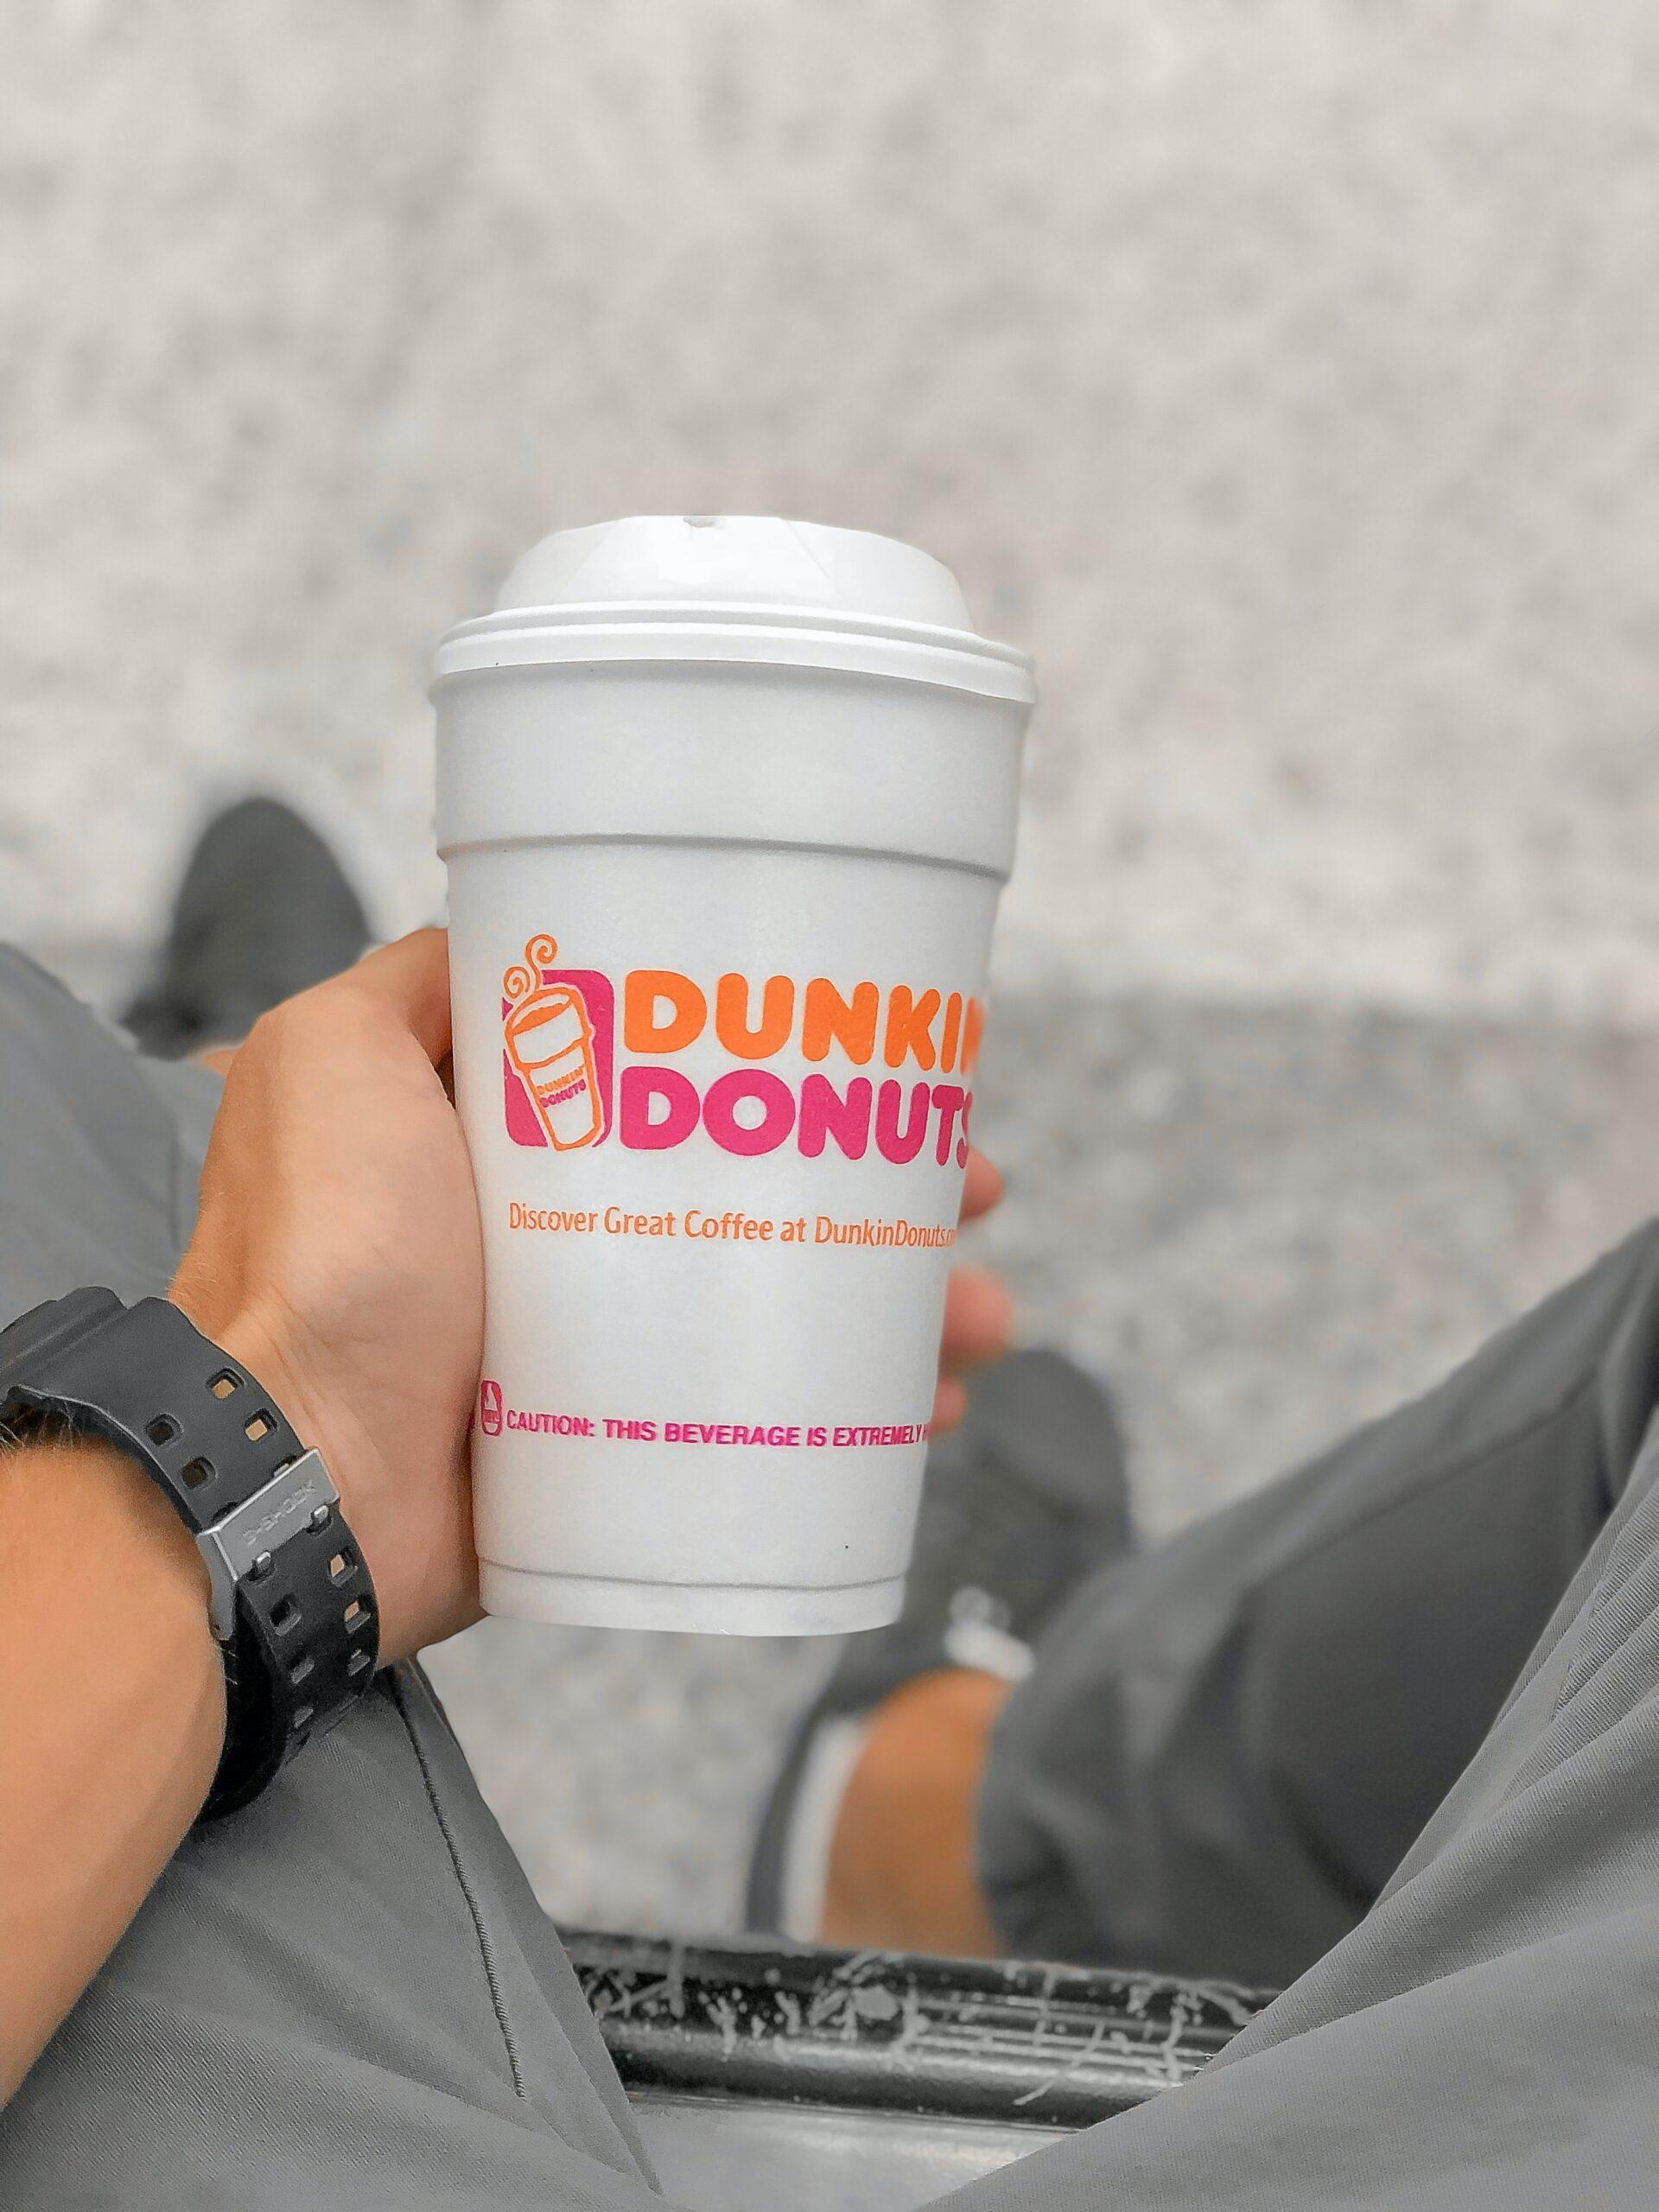 dunkin brands,dunkin donuts,dunkin brands sale,dunkin brands private